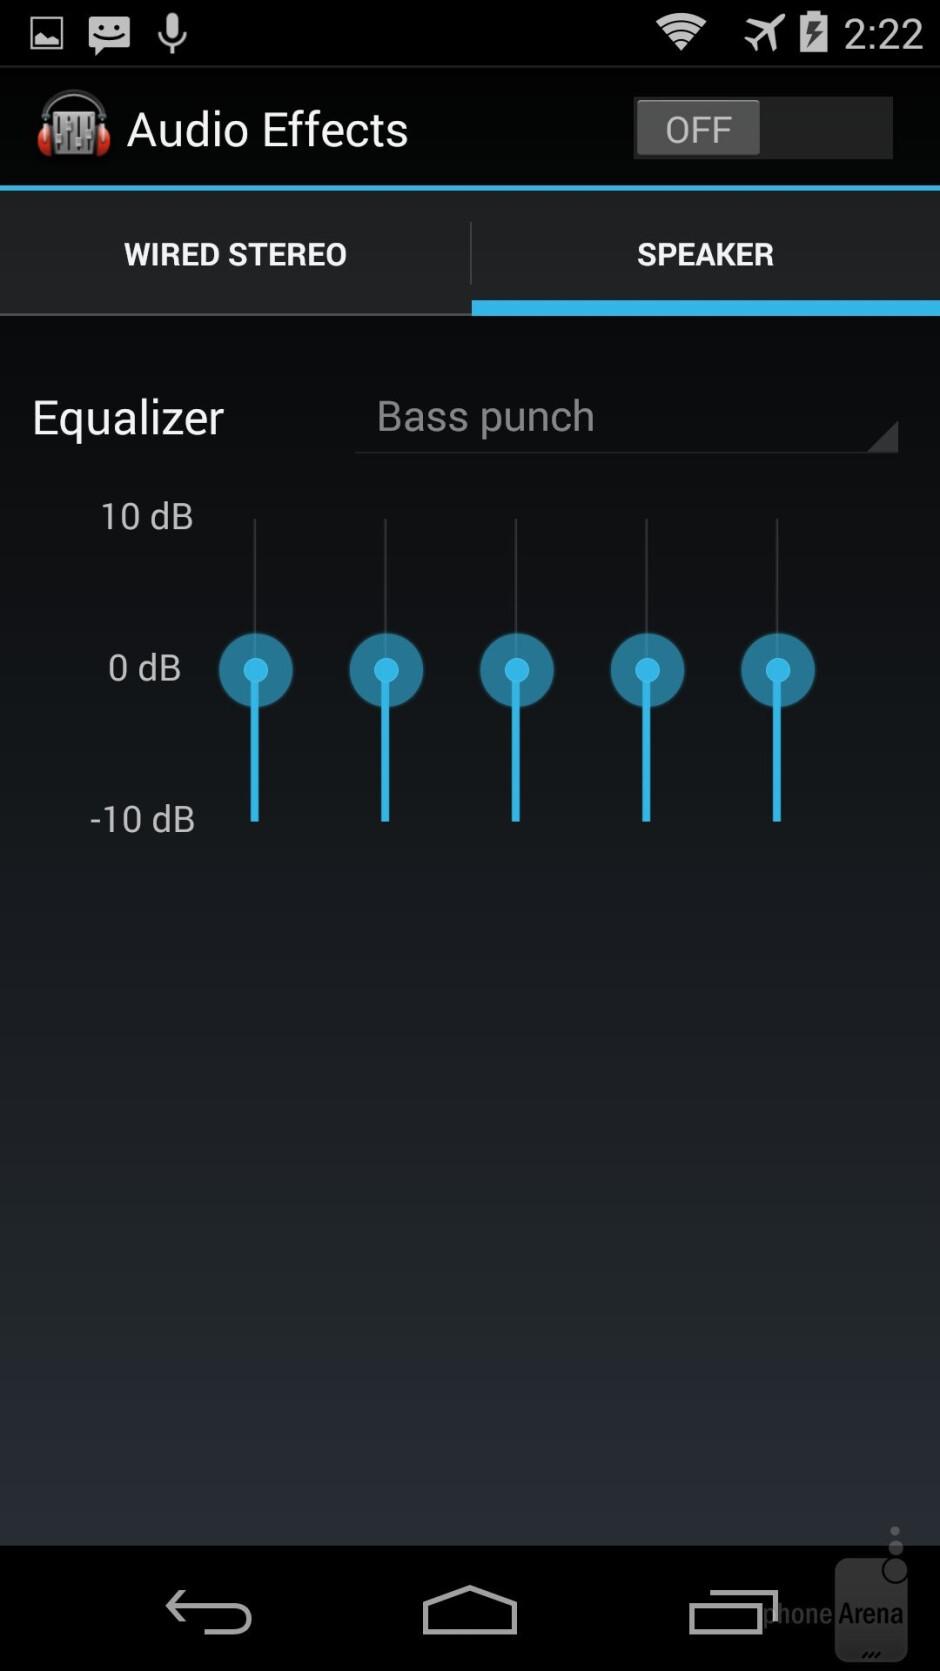 The two Moto Xs resort to the Google Play Music app as the default music player - Motorola Moto X 2014 vs Moto X 2013